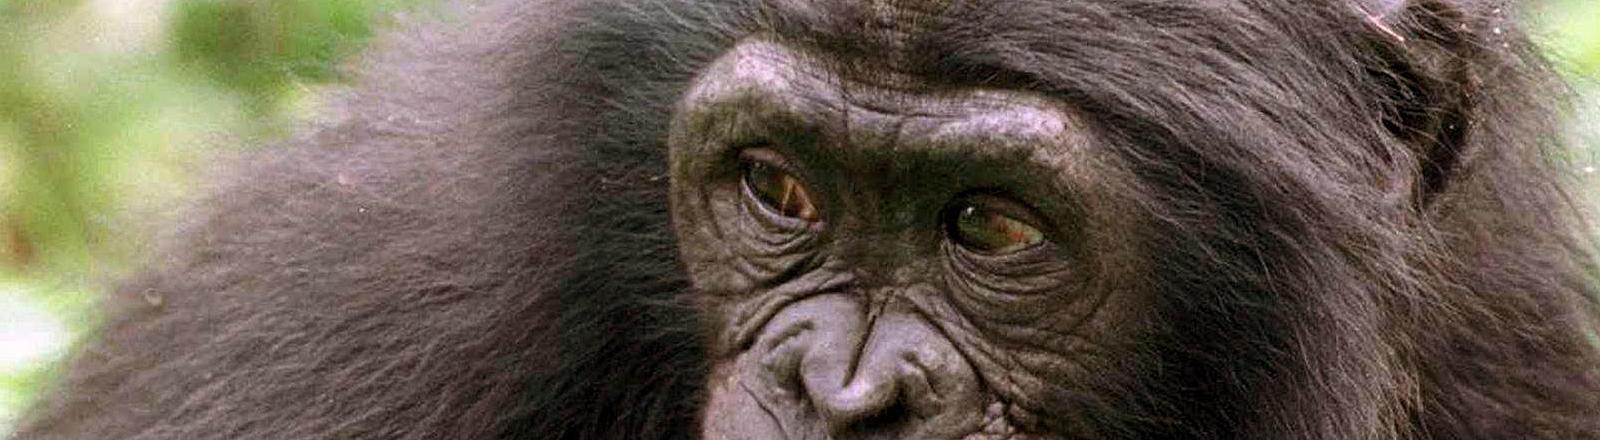 Ein Bonobo-Affe (Pan paniscus), aufgenommen am 21.5.2000 im Bonobo-Schutzgebiet bei Kinshasa.